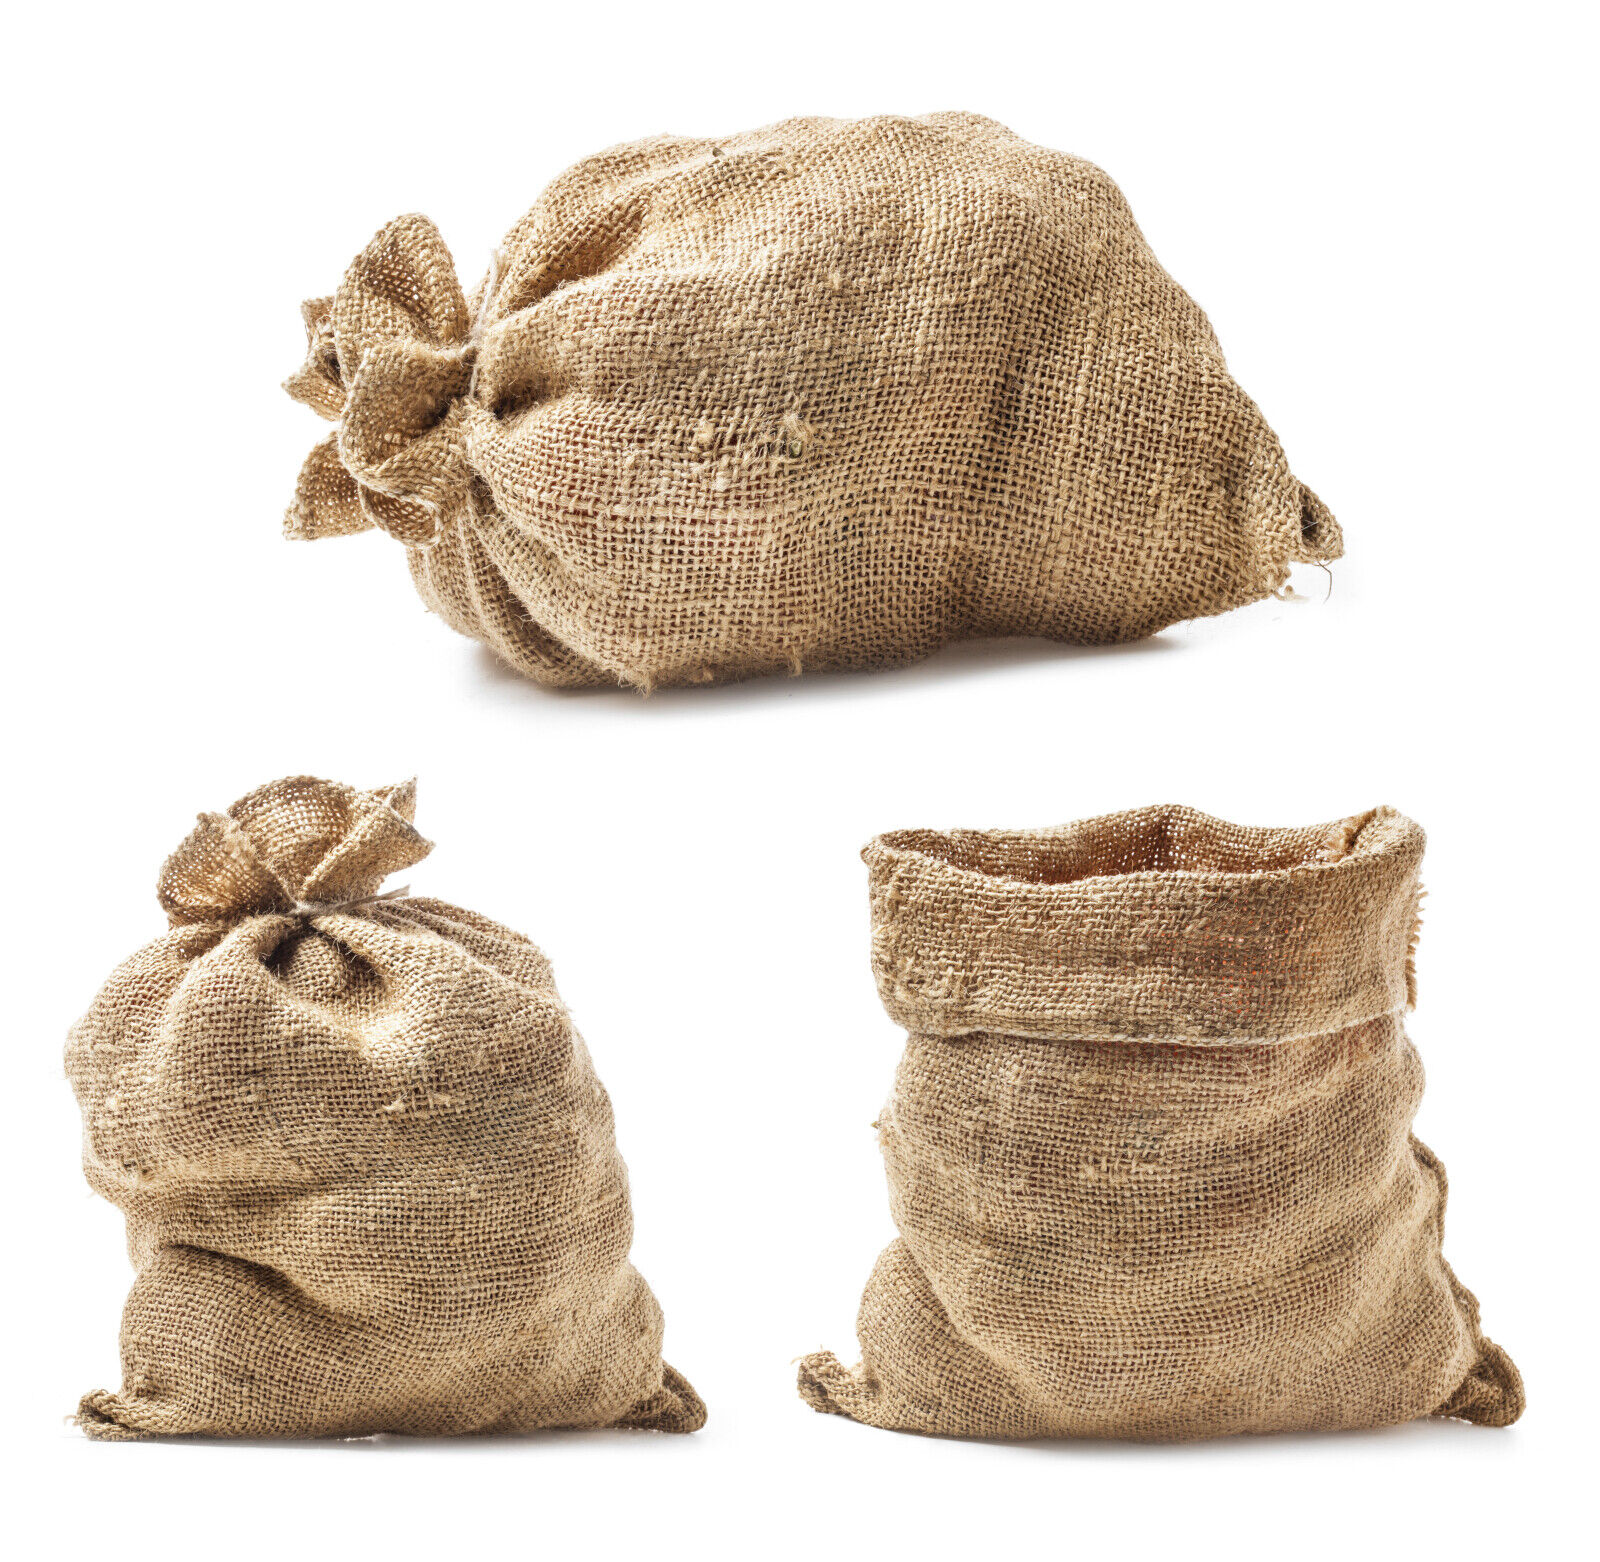 Kartoffelsack Sack Jutesack Gewebesäcke Getreidesack Raschelsäcke Laubsack 25 kg